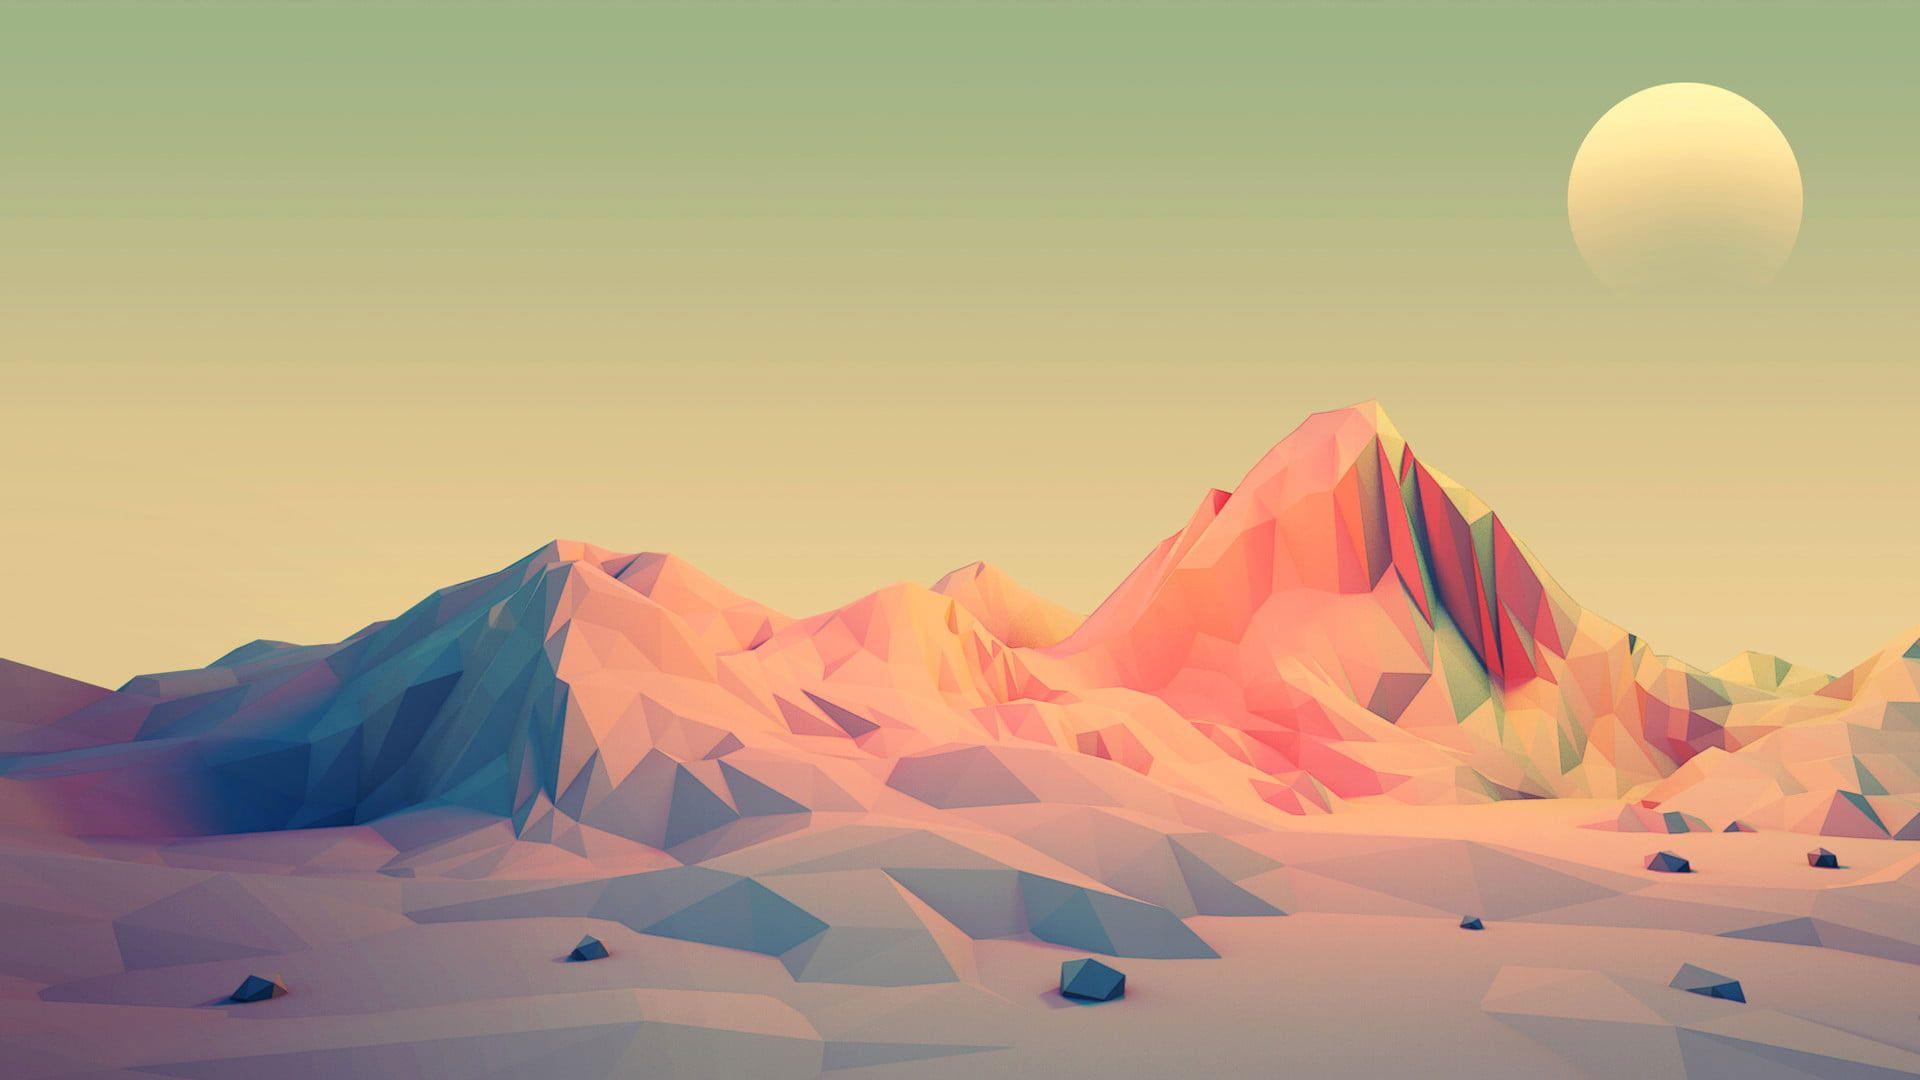 Vector Wallpaper Mountain illustration wallpaper mountains 1920x1080